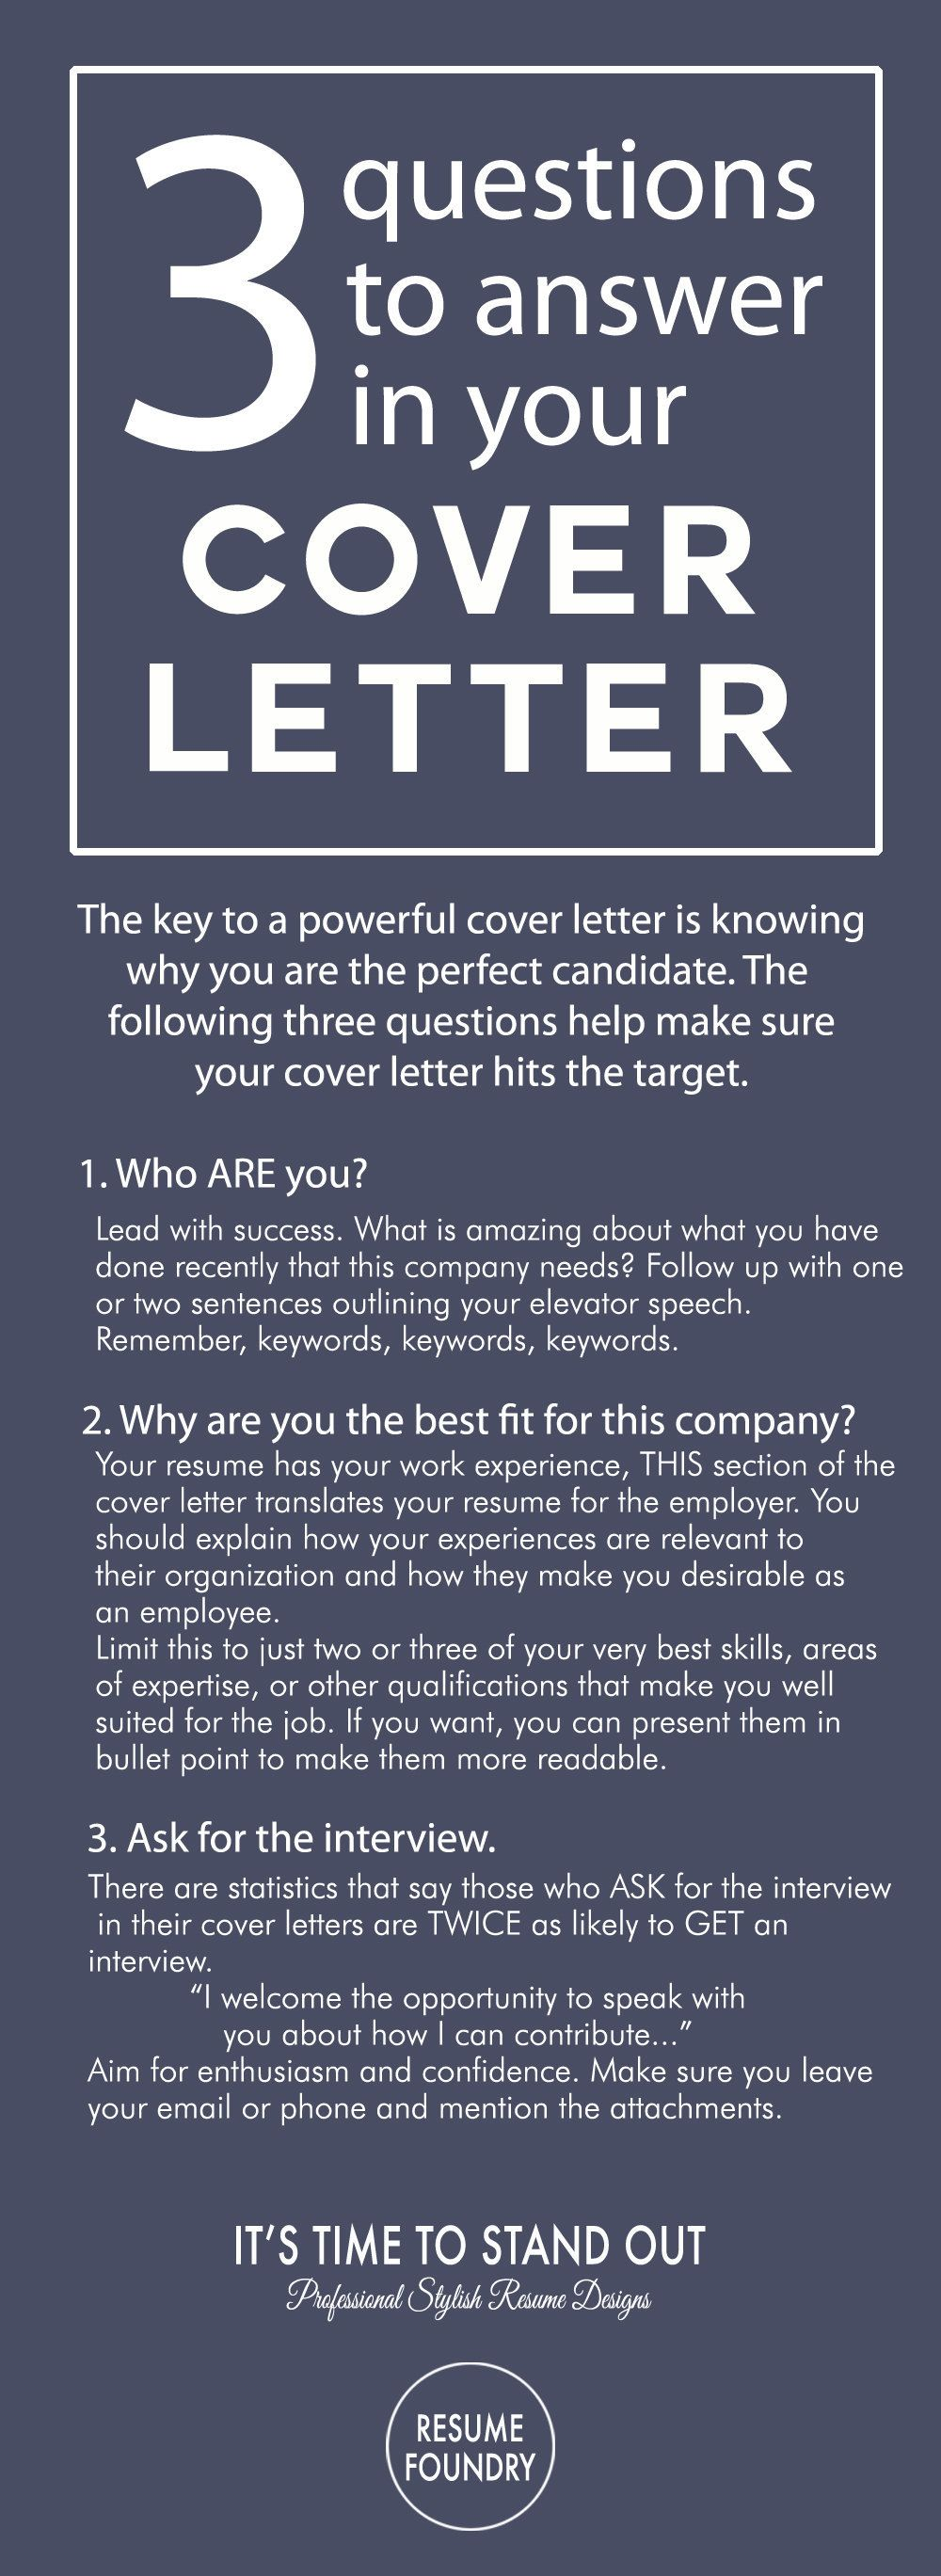 Blog - Resume Foundry on Etsy | #Resume Tips | Job career ...